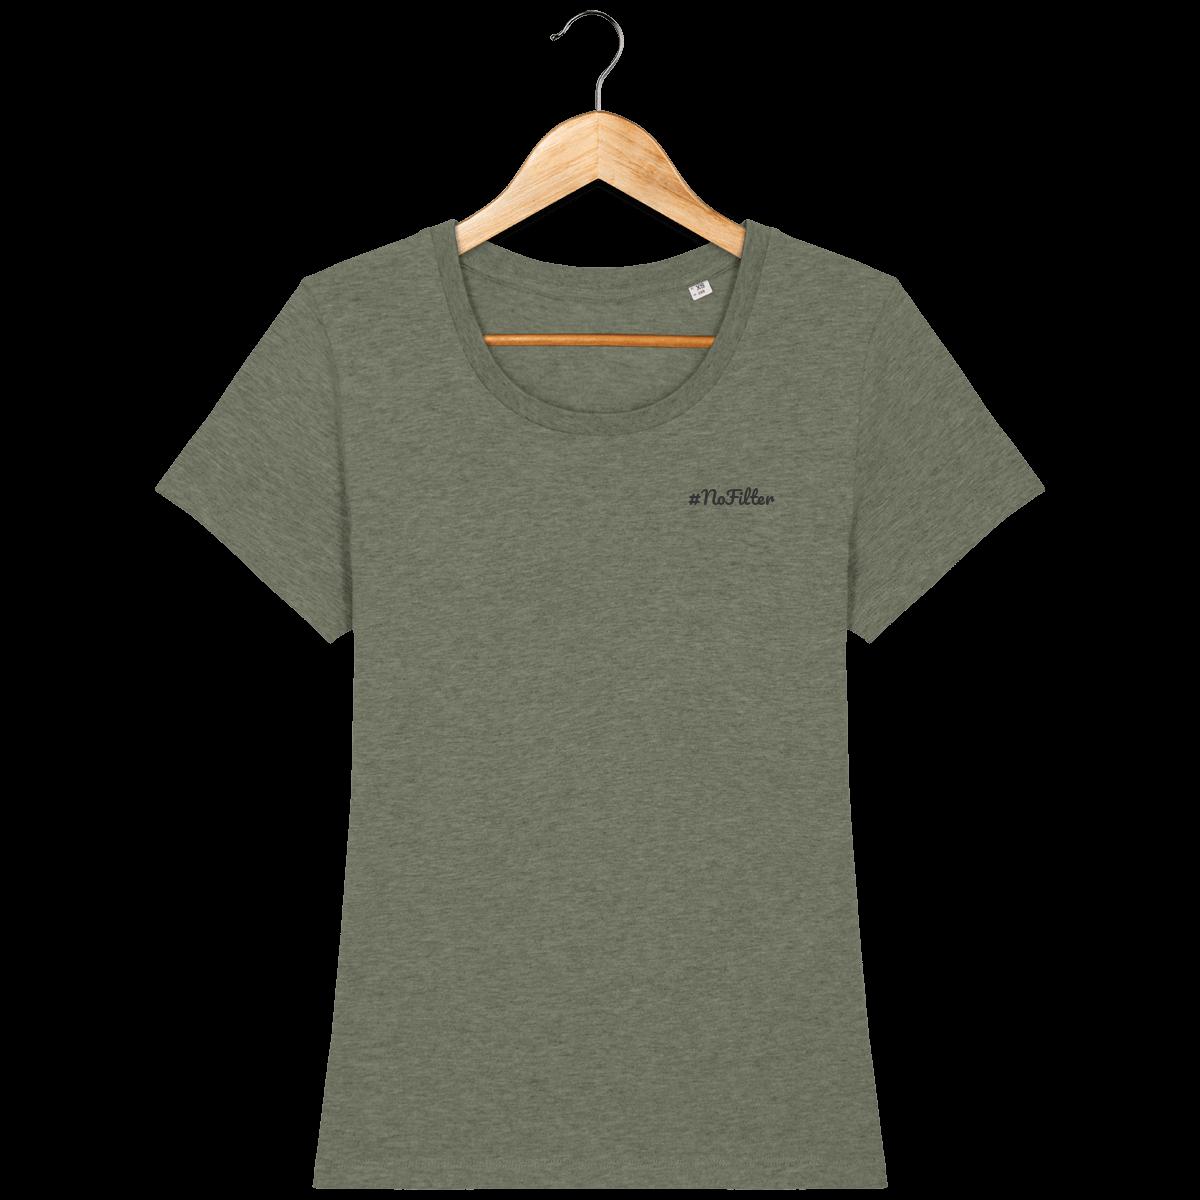 t-shirt-bio-brode-nofilter-caribbeanblue-darkgrey_mid-heather-khaki_face